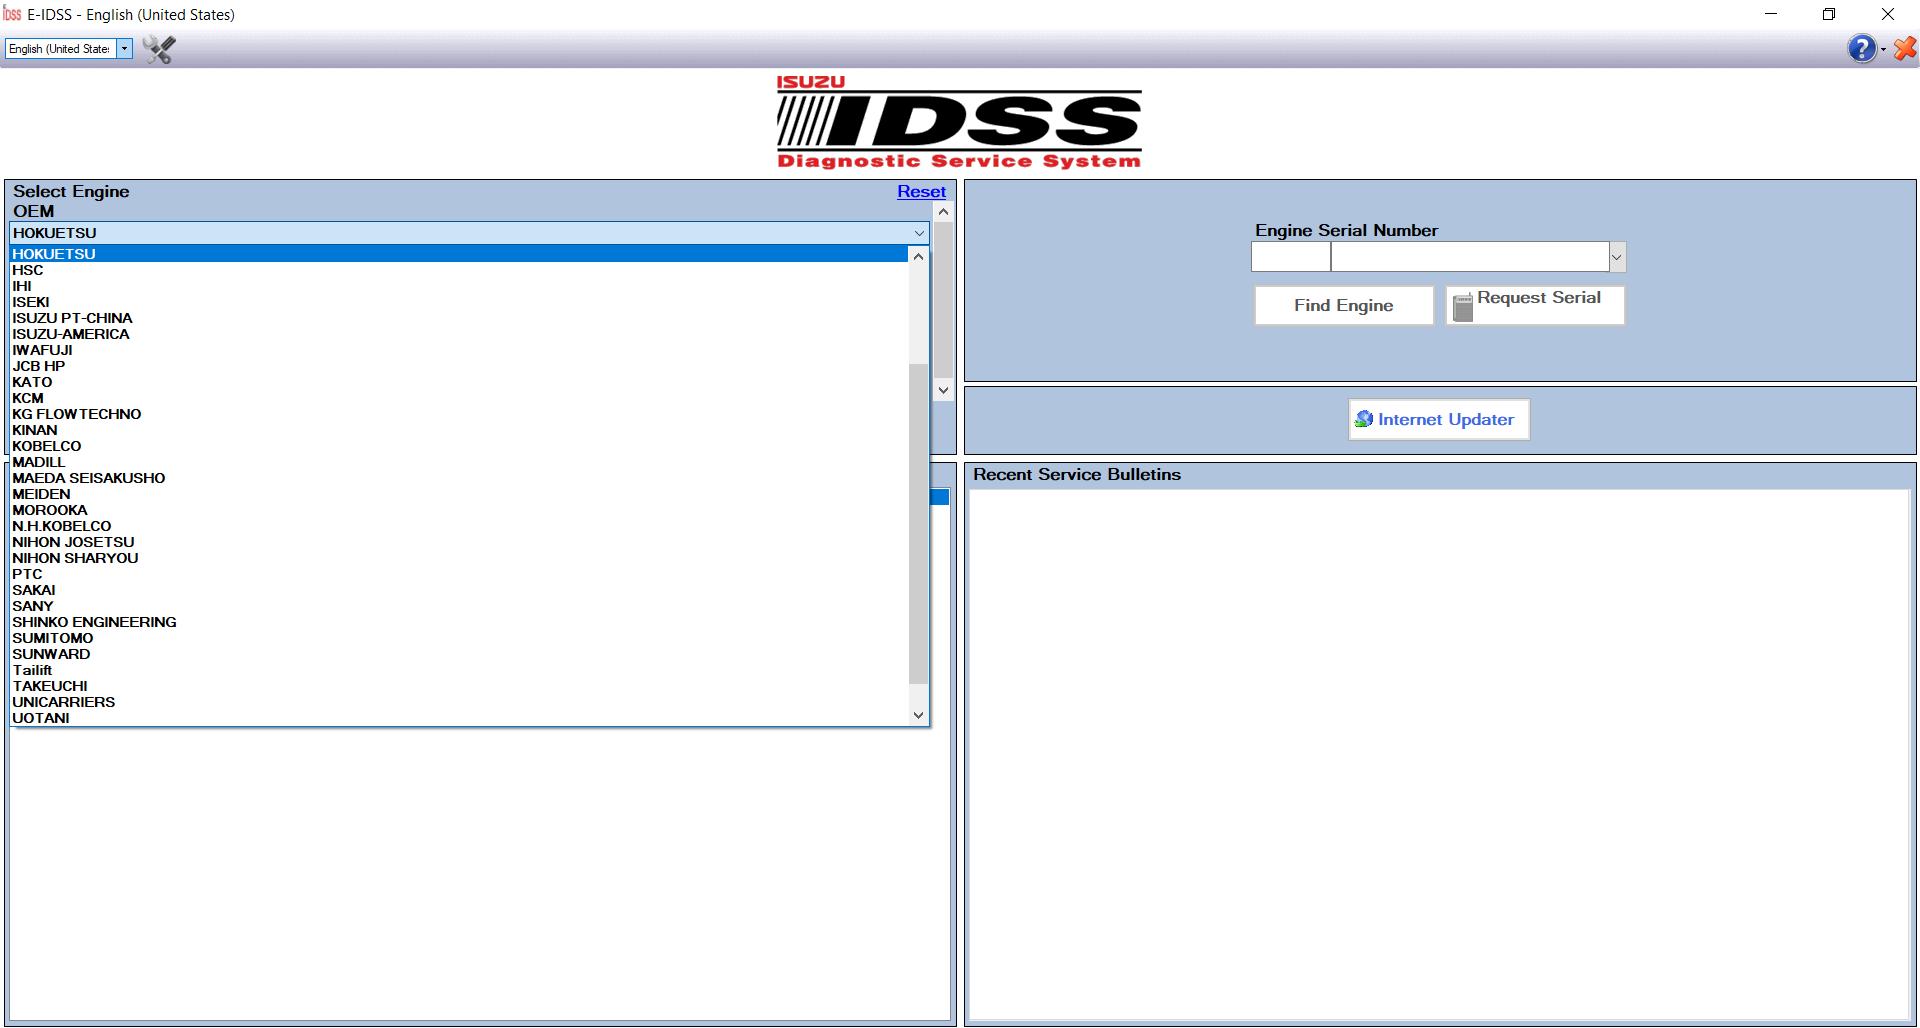 ISUZU E-IDSS 03.2021